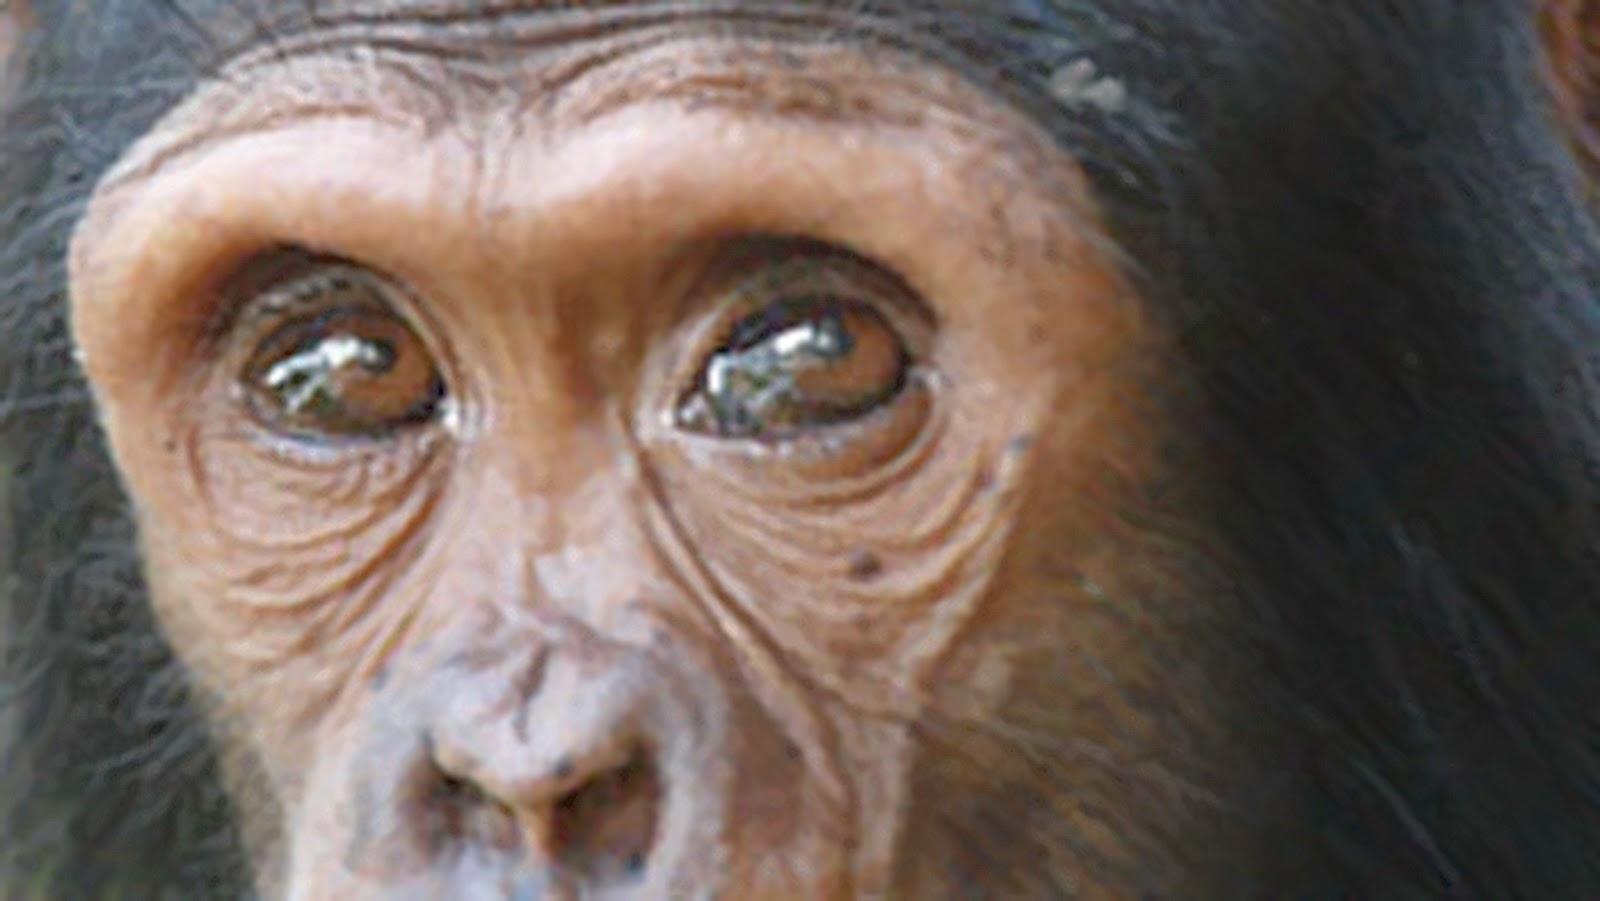 10 Spesies Hewan Paling Cerdas di Bumi